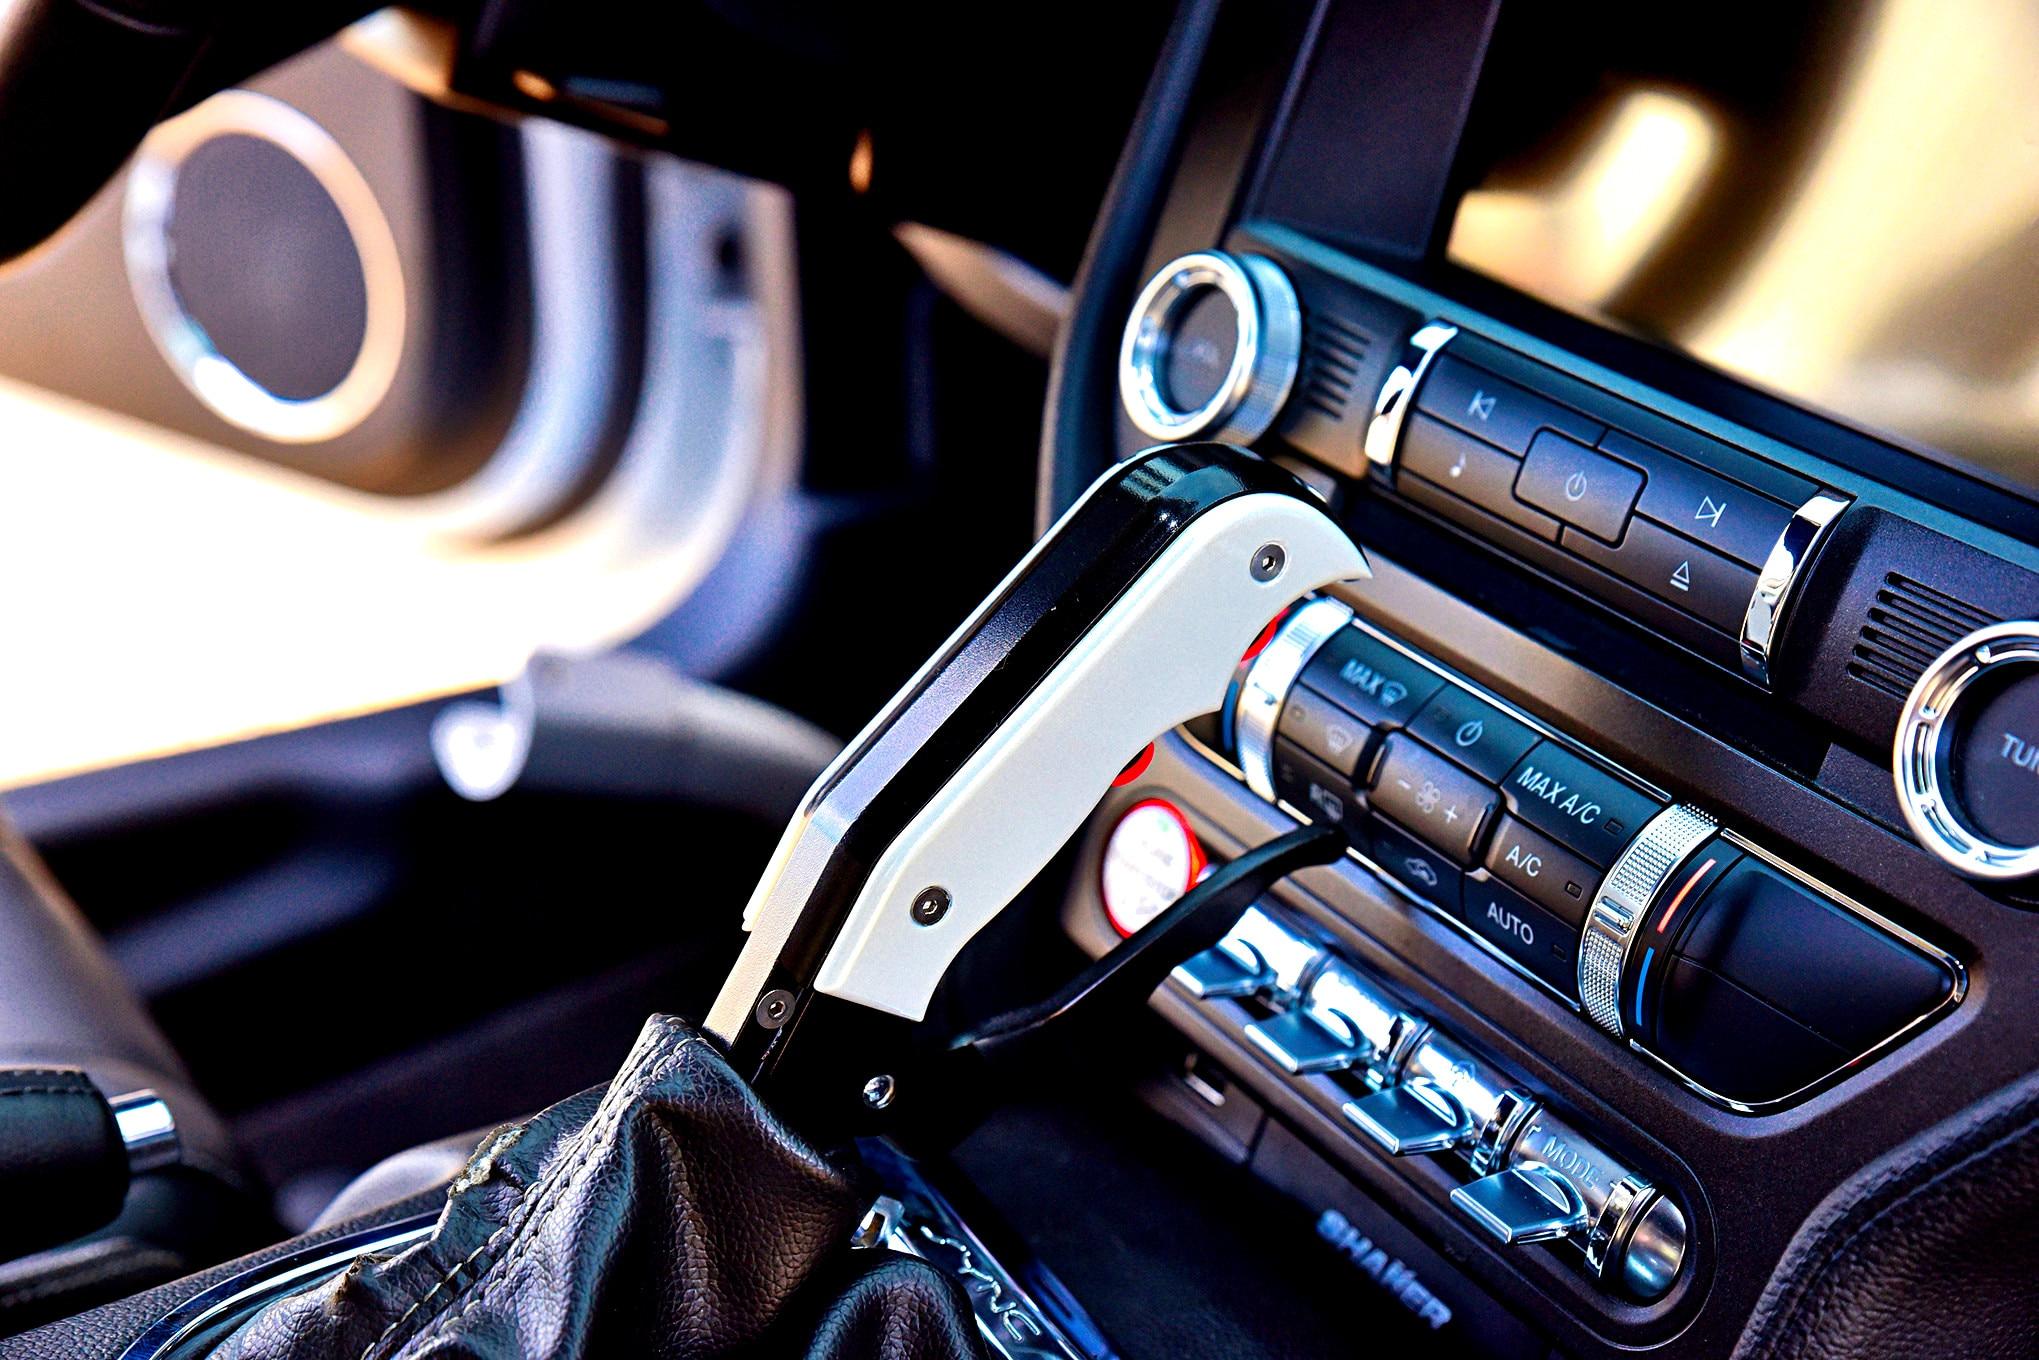 Sheldon Lewis S550 Ford Mustang 013